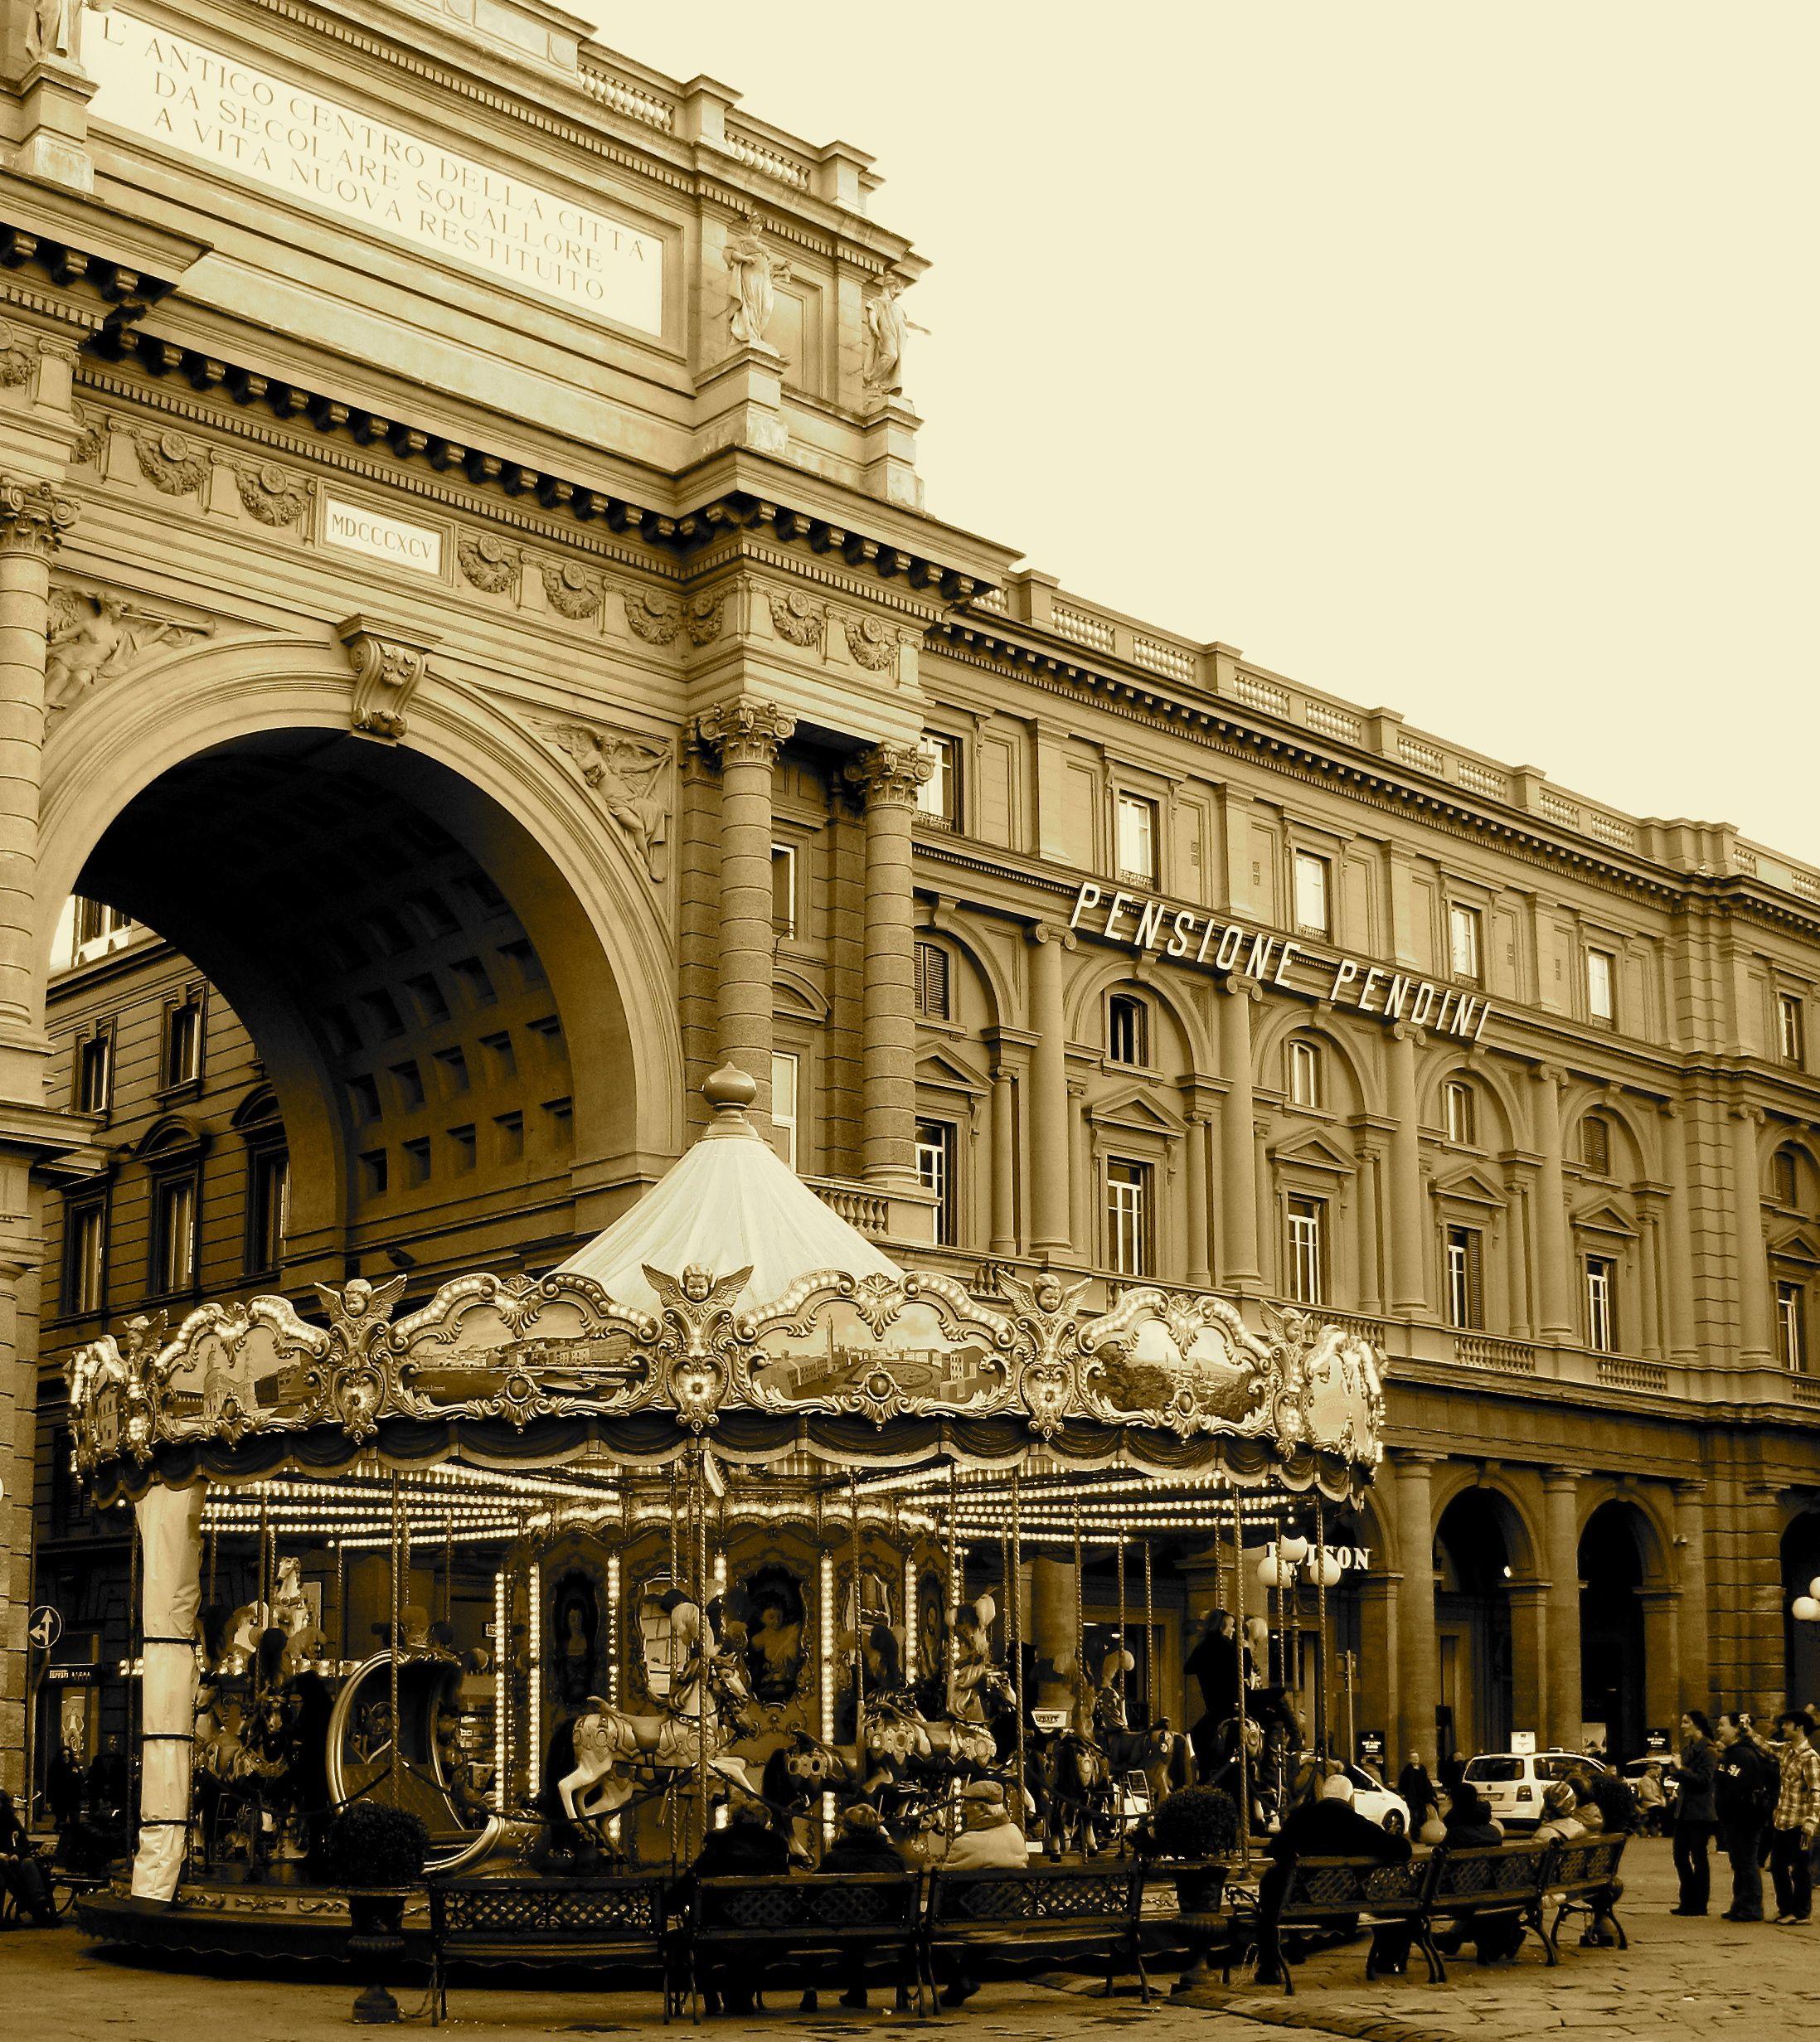 Giardino Orticoltura Firenze: Firenze To Learn More, Visit Www.goabbeyroad.com